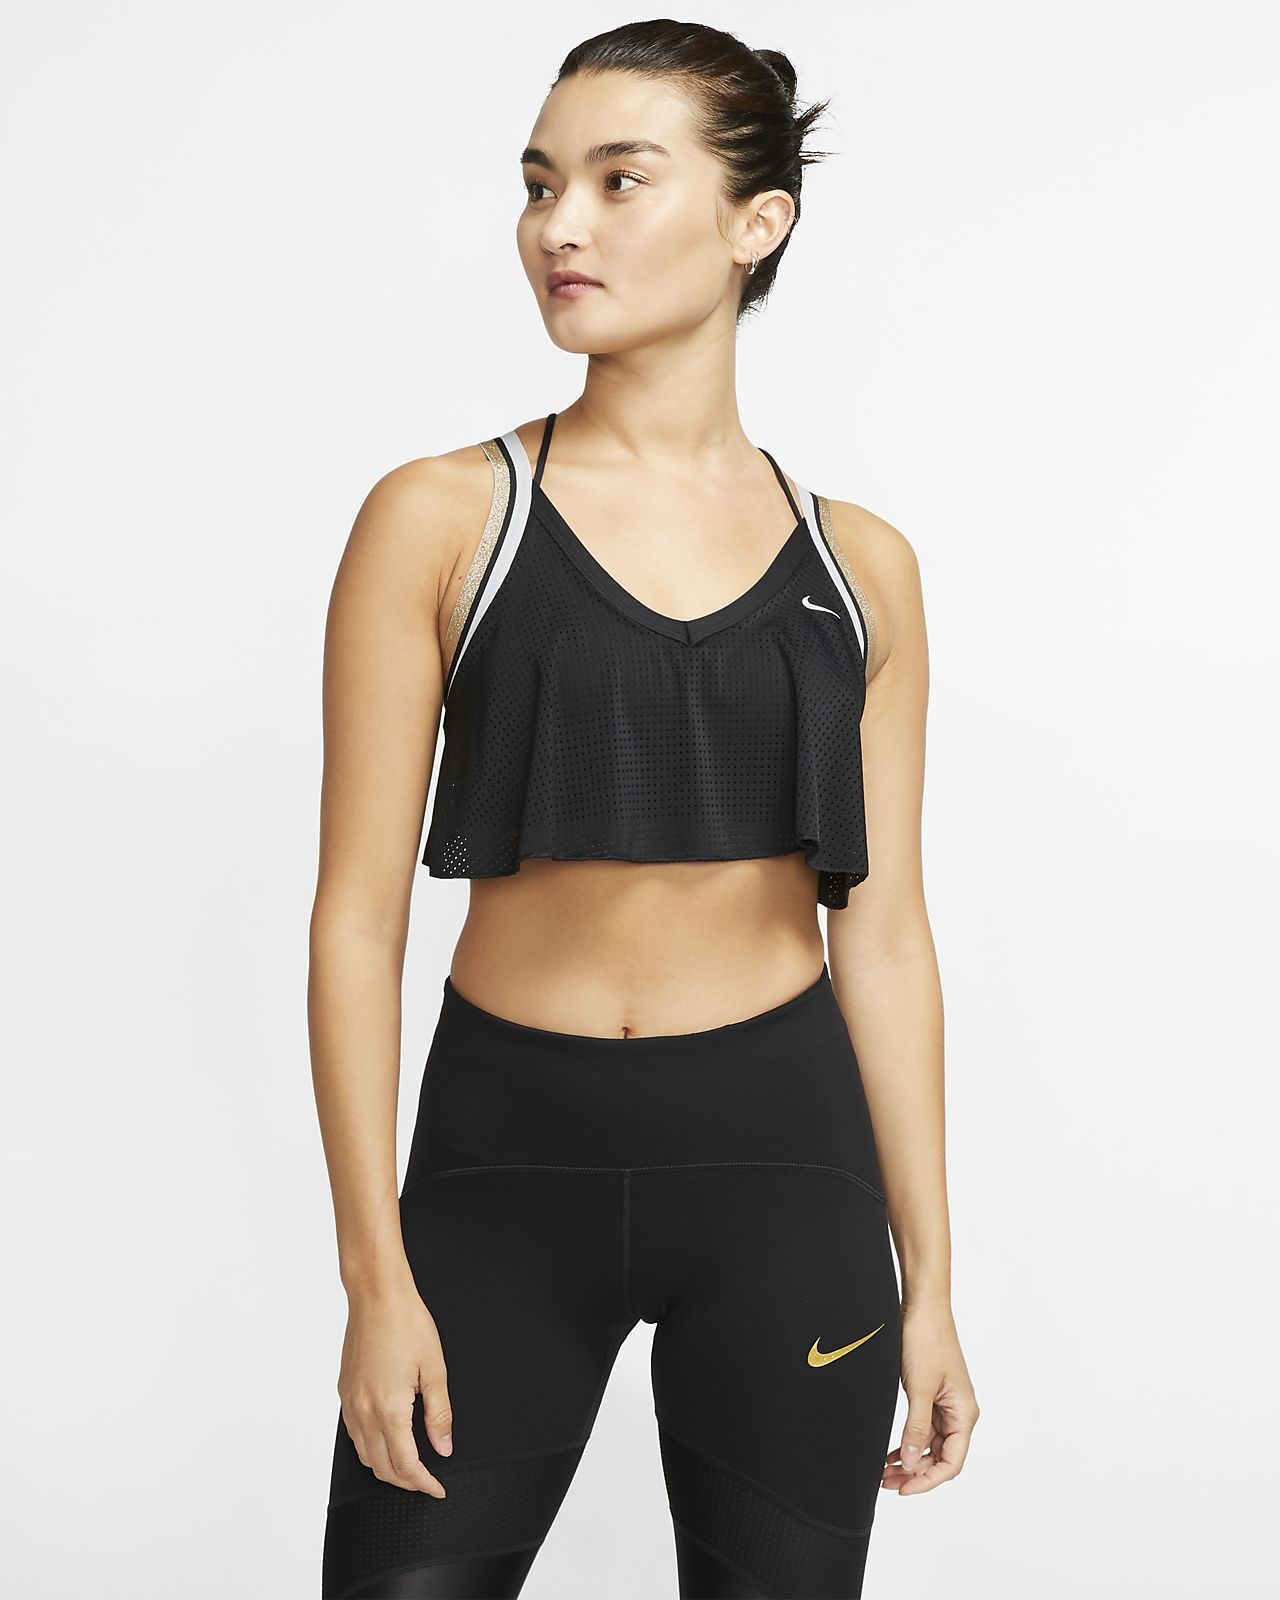 Nike Women's Light-Support Sports Bra